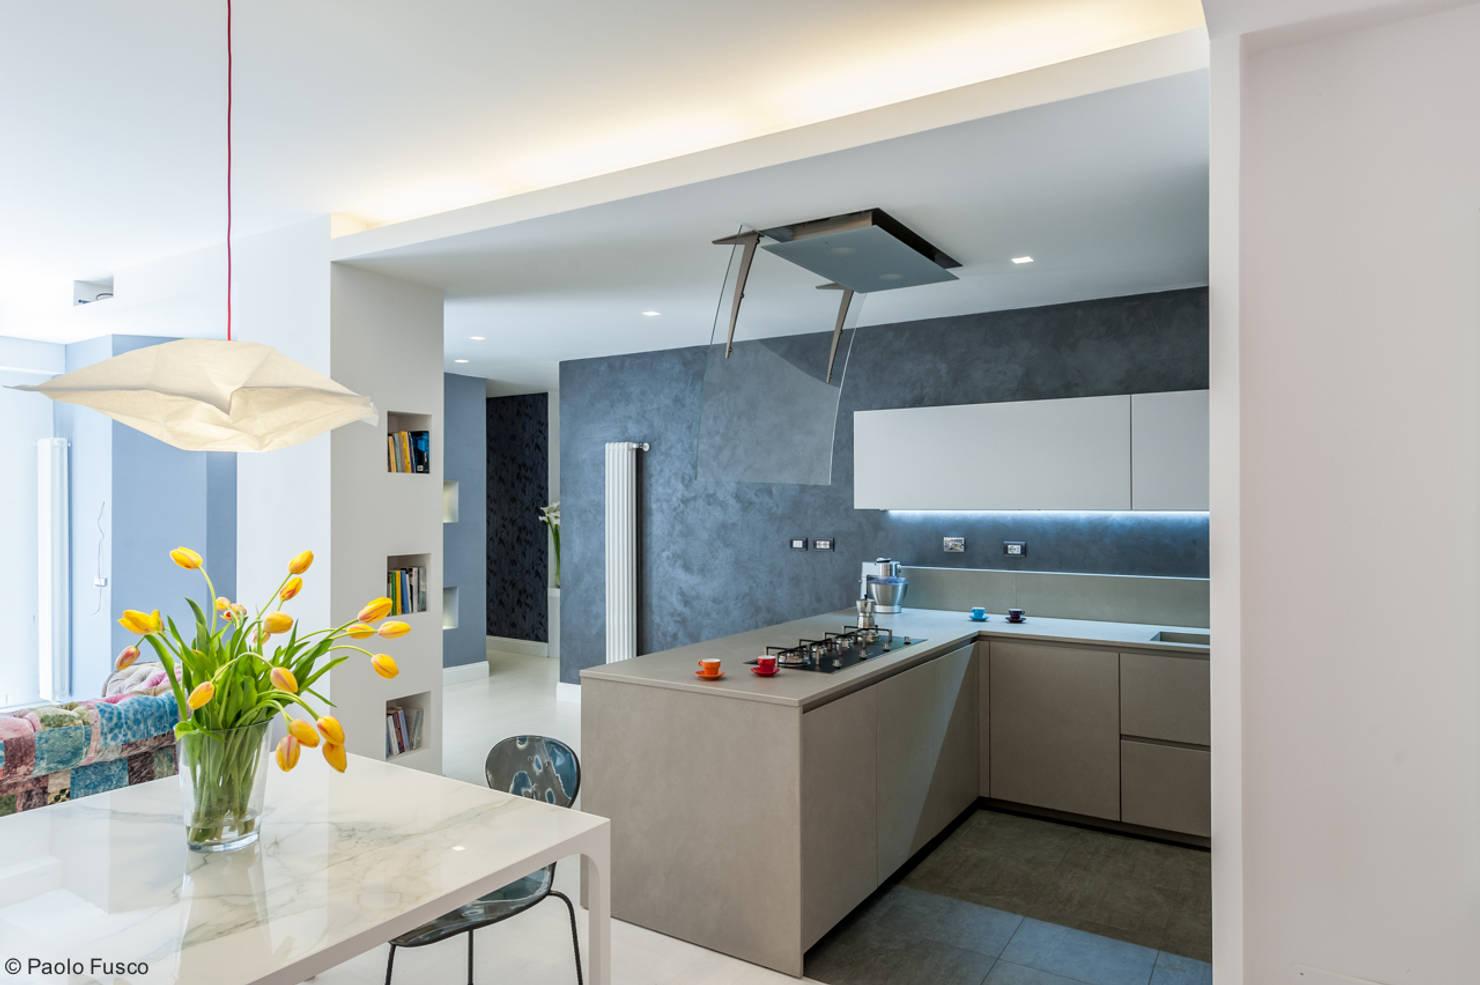 7 small but modern kitchen peninsulas to copy!